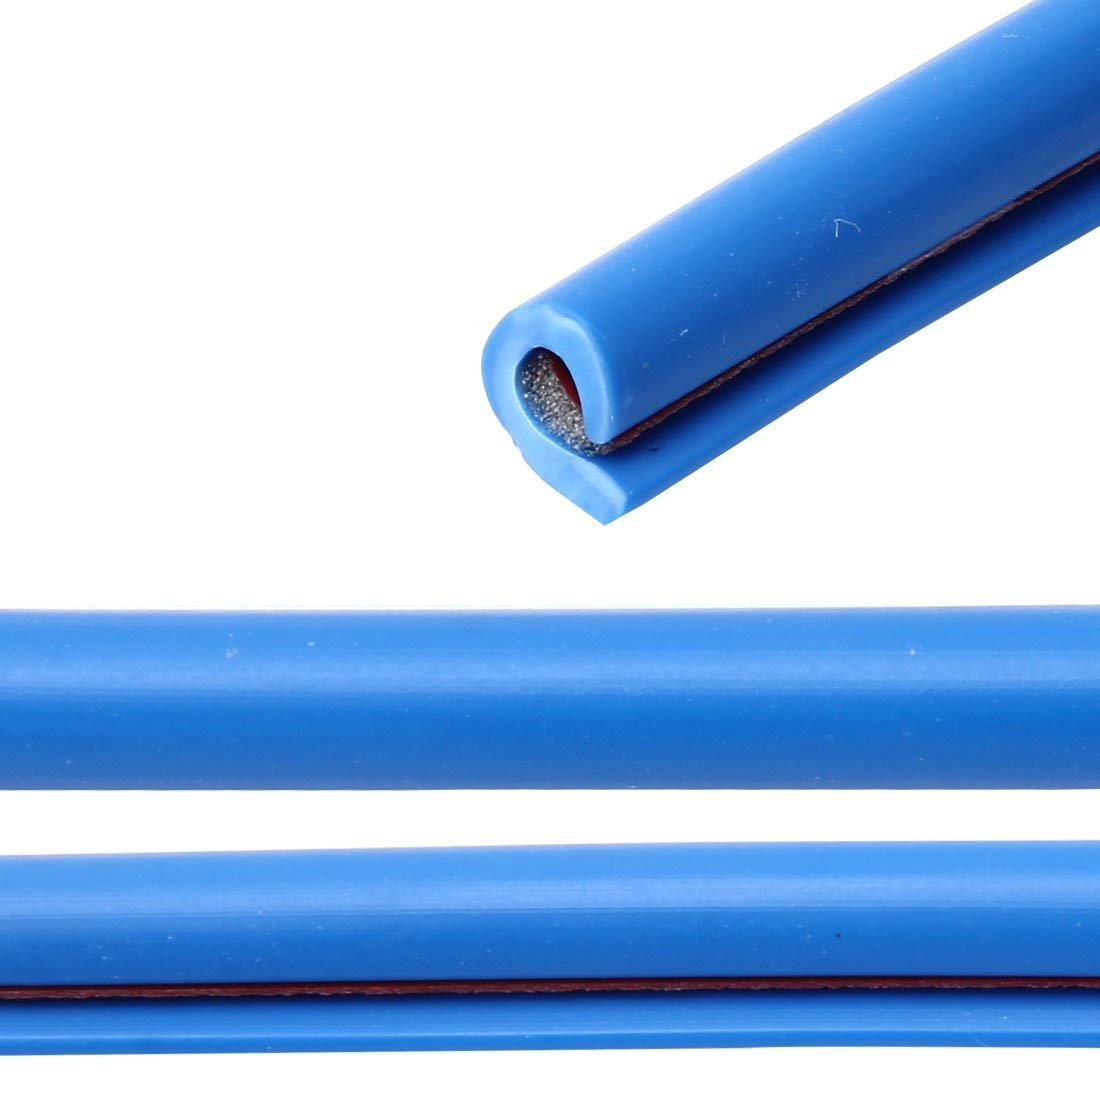 Protecci/ón Canto Puerta 5m en Azul para Coche Cortable Autoadhesivo Coche Veh/ículo Perfiles en u Altamente Flexible